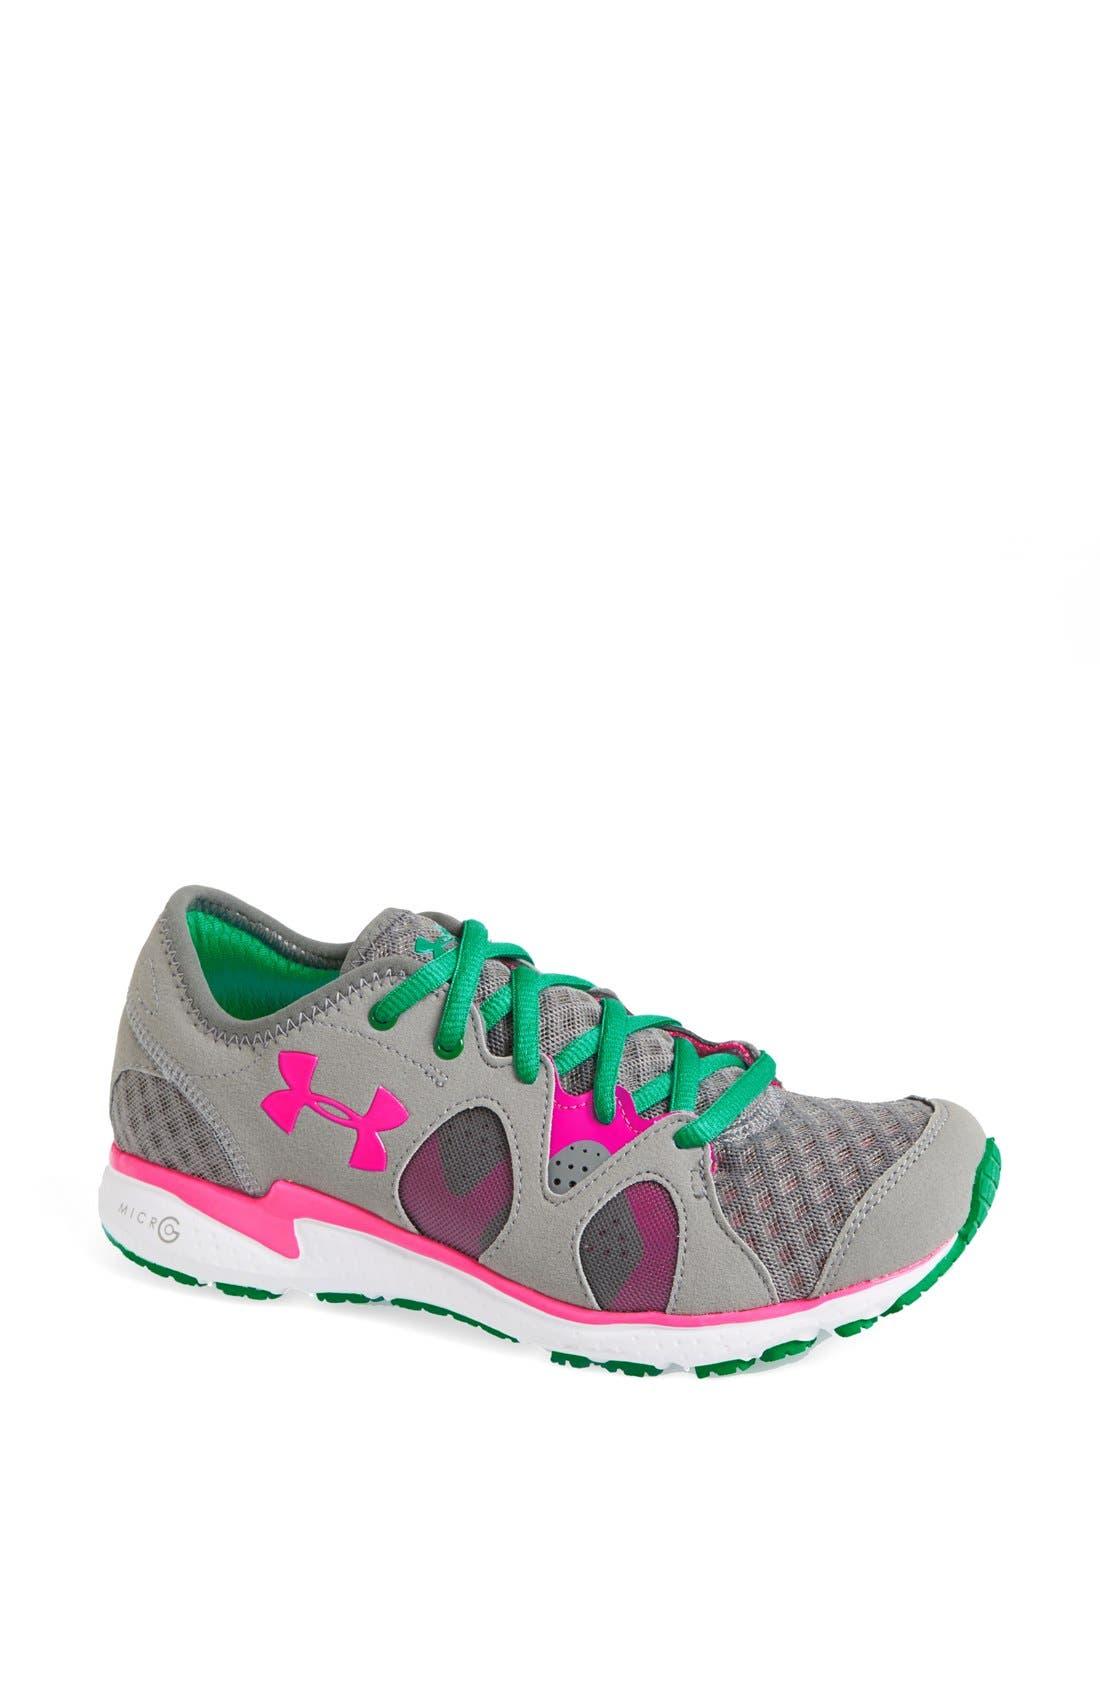 Alternate Image 1 Selected - Under Armour 'Micro G® Neo Mantis' Running Shoe (Women)